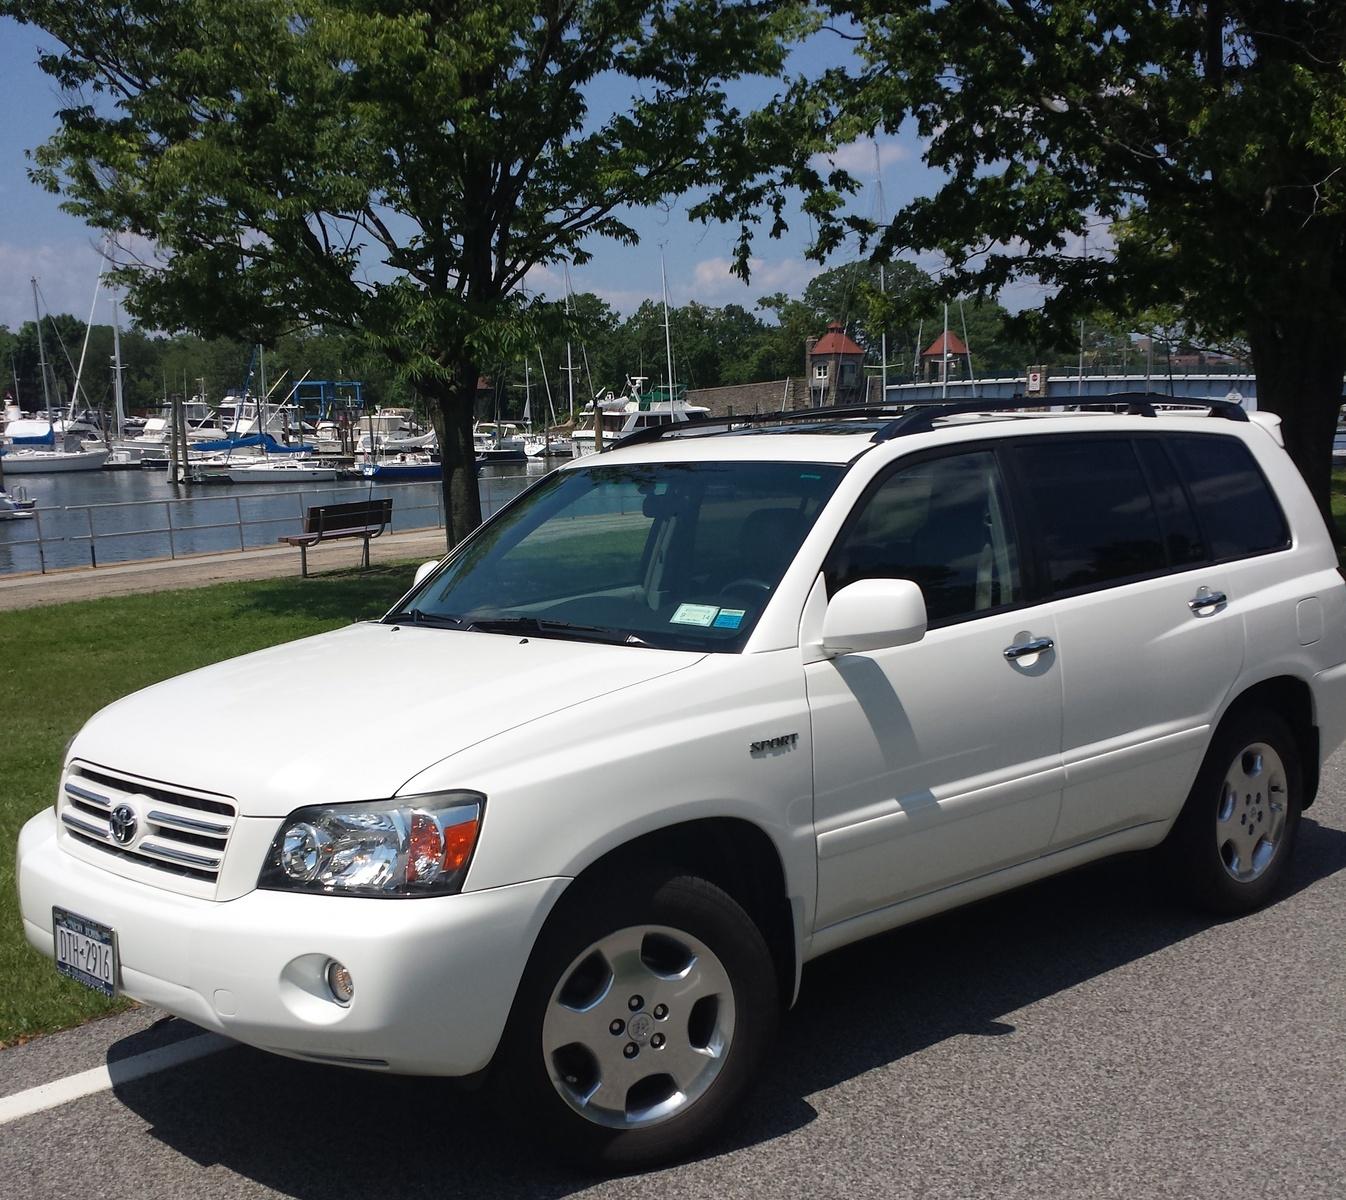 Toyota Highlander Reviews: 2006 Toyota Highlander